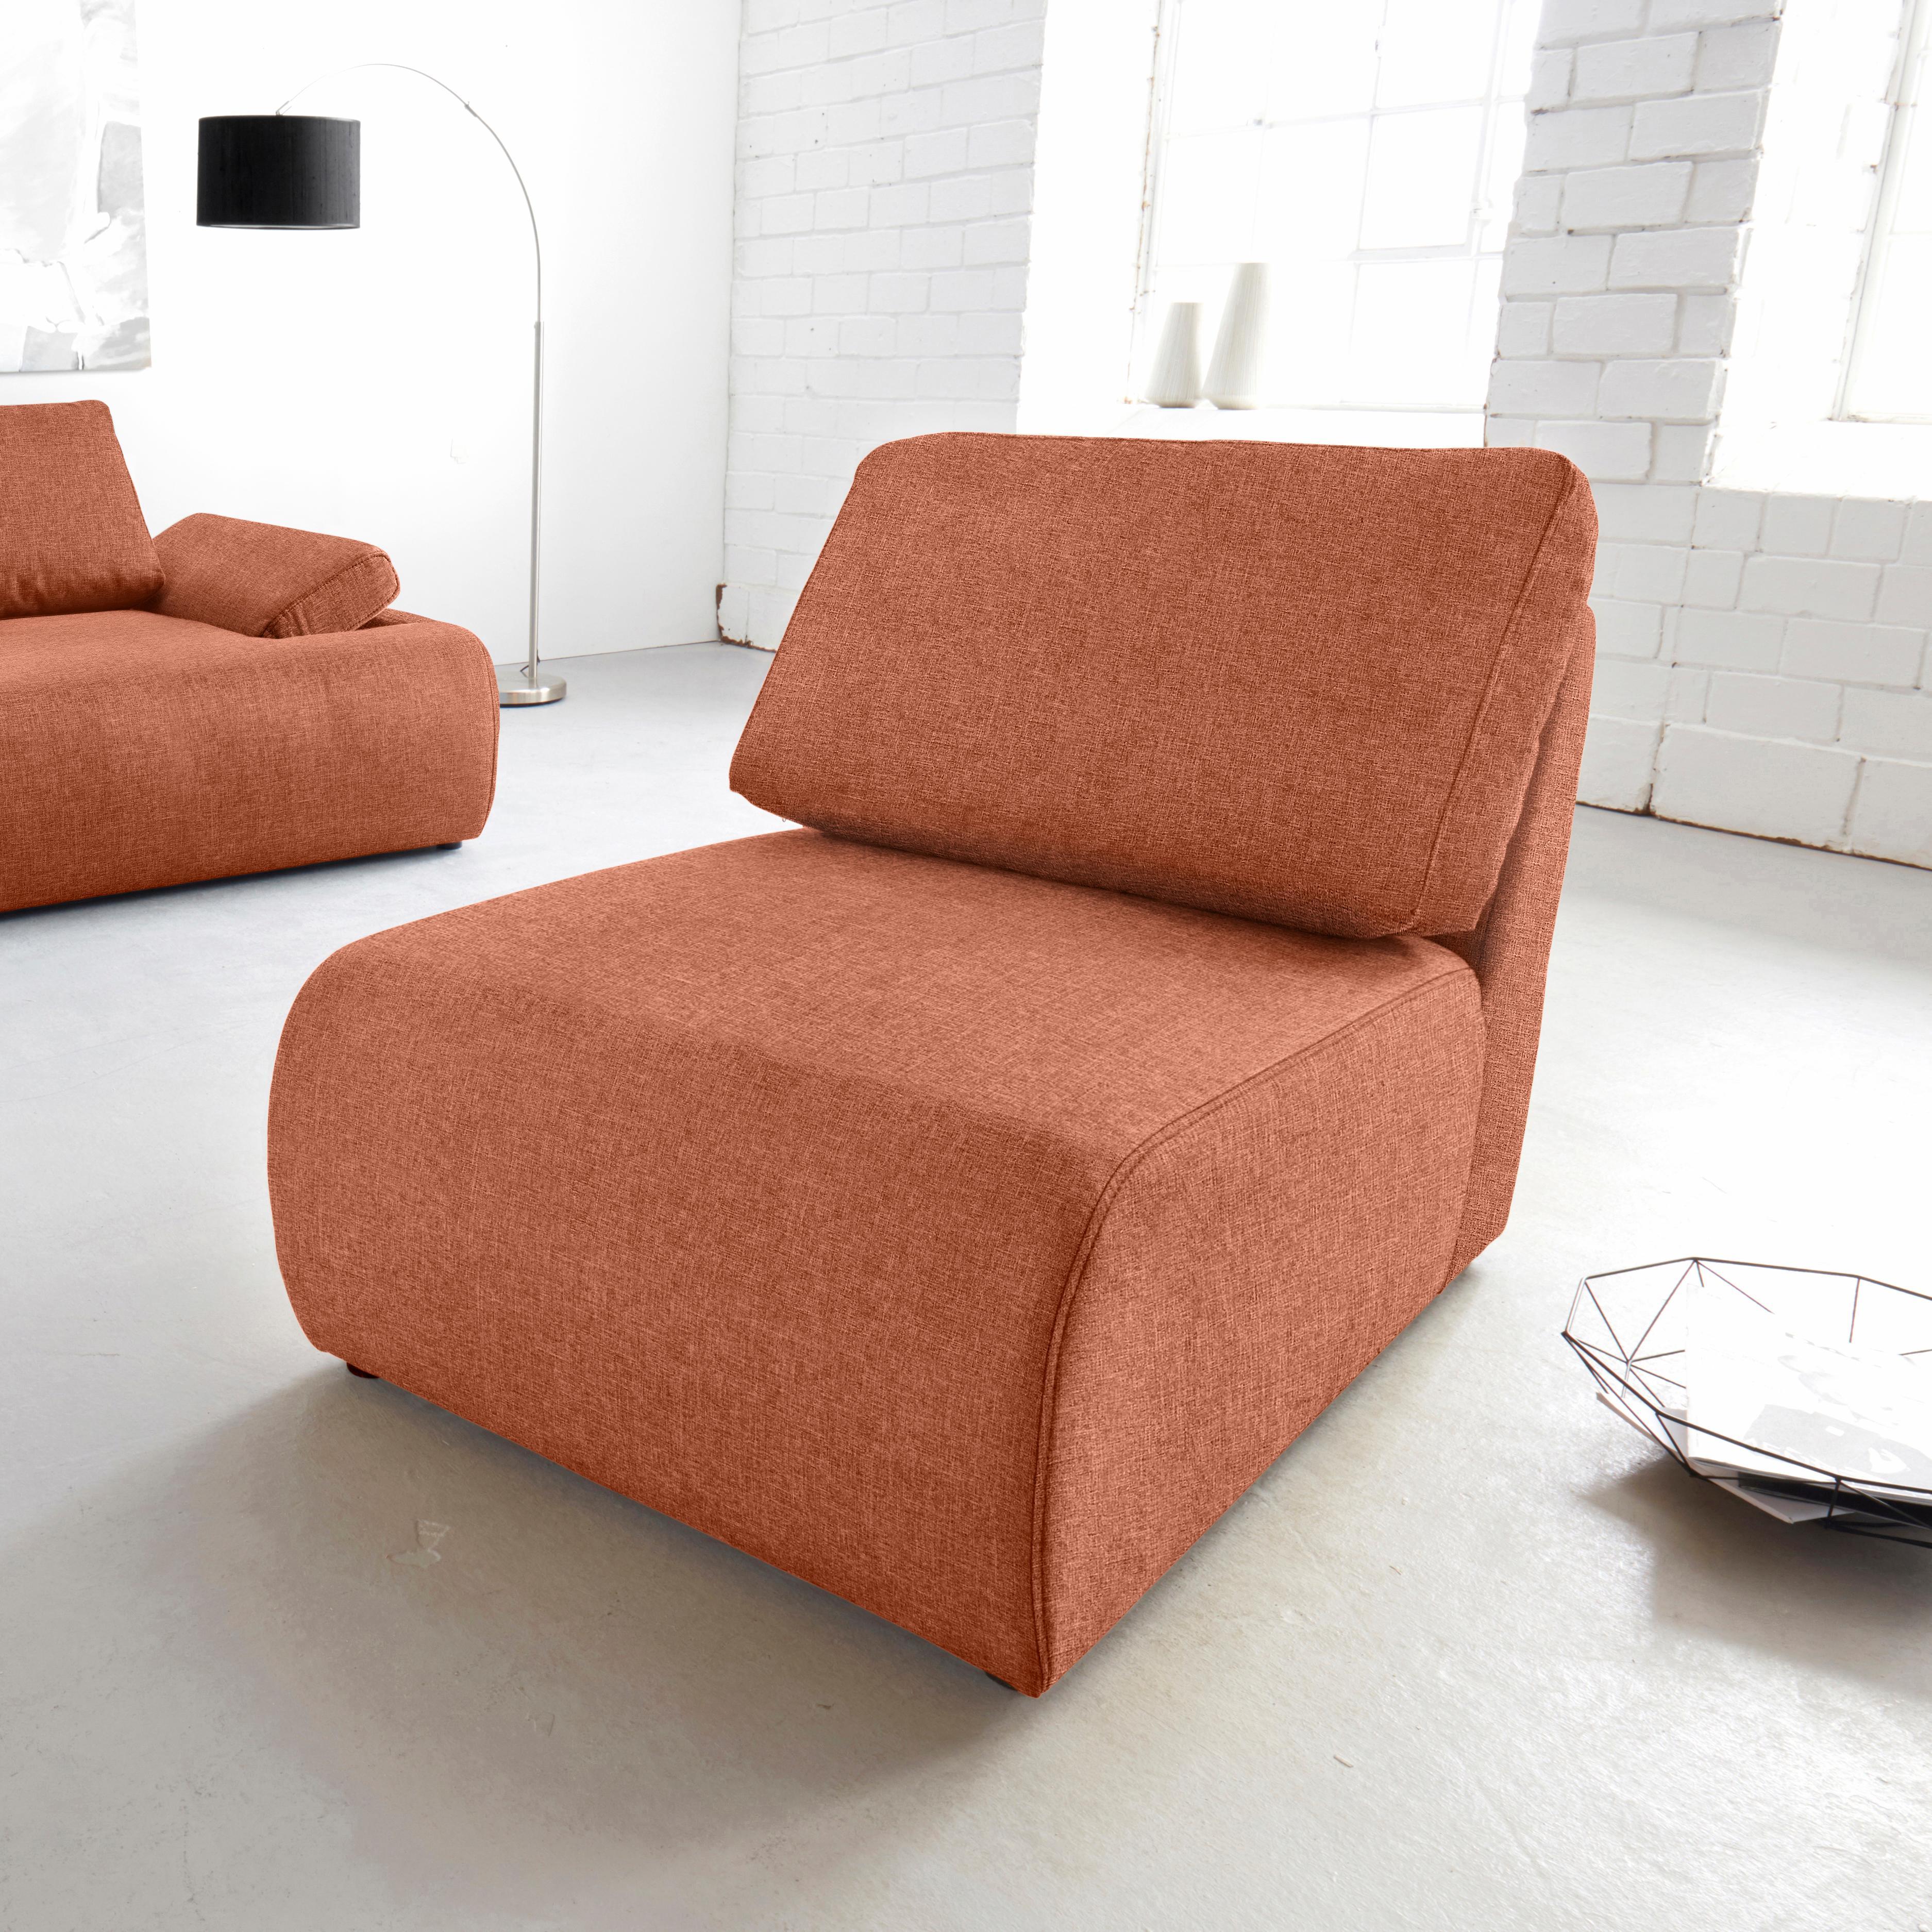 INOSIGN Sessel Inosign kaufen bei OTTO